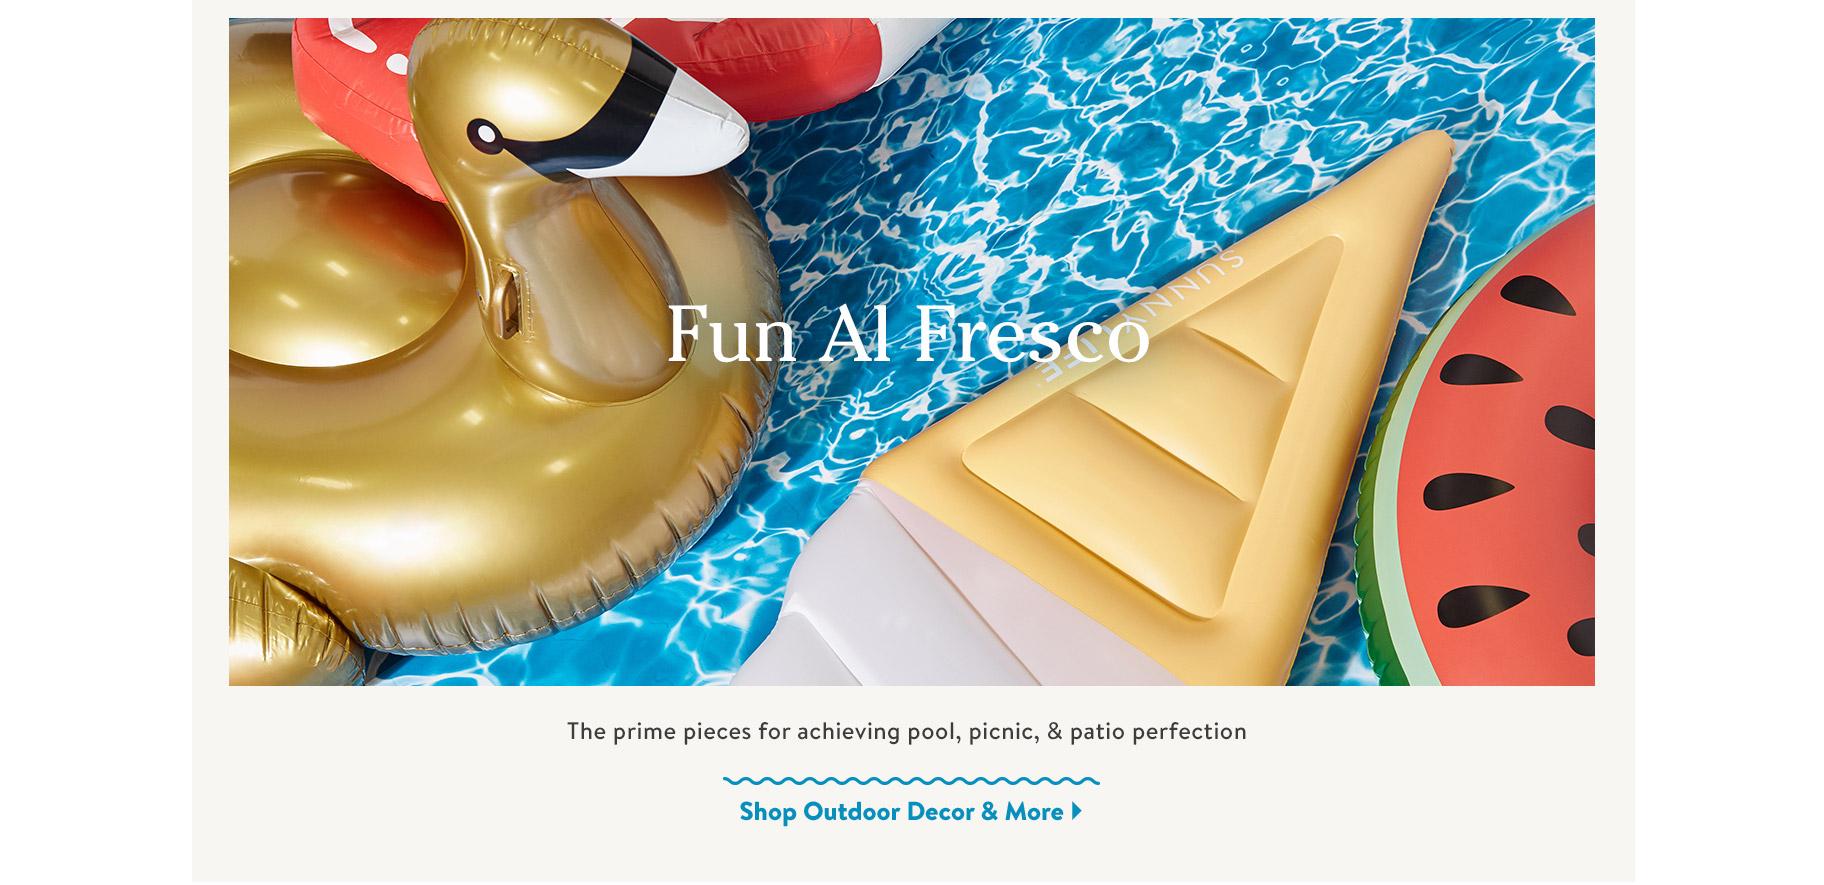 Fun Al Fresco. The prime pieces for achieving pool, picnic, & patio perfection. Shop Outdoor Decor & More